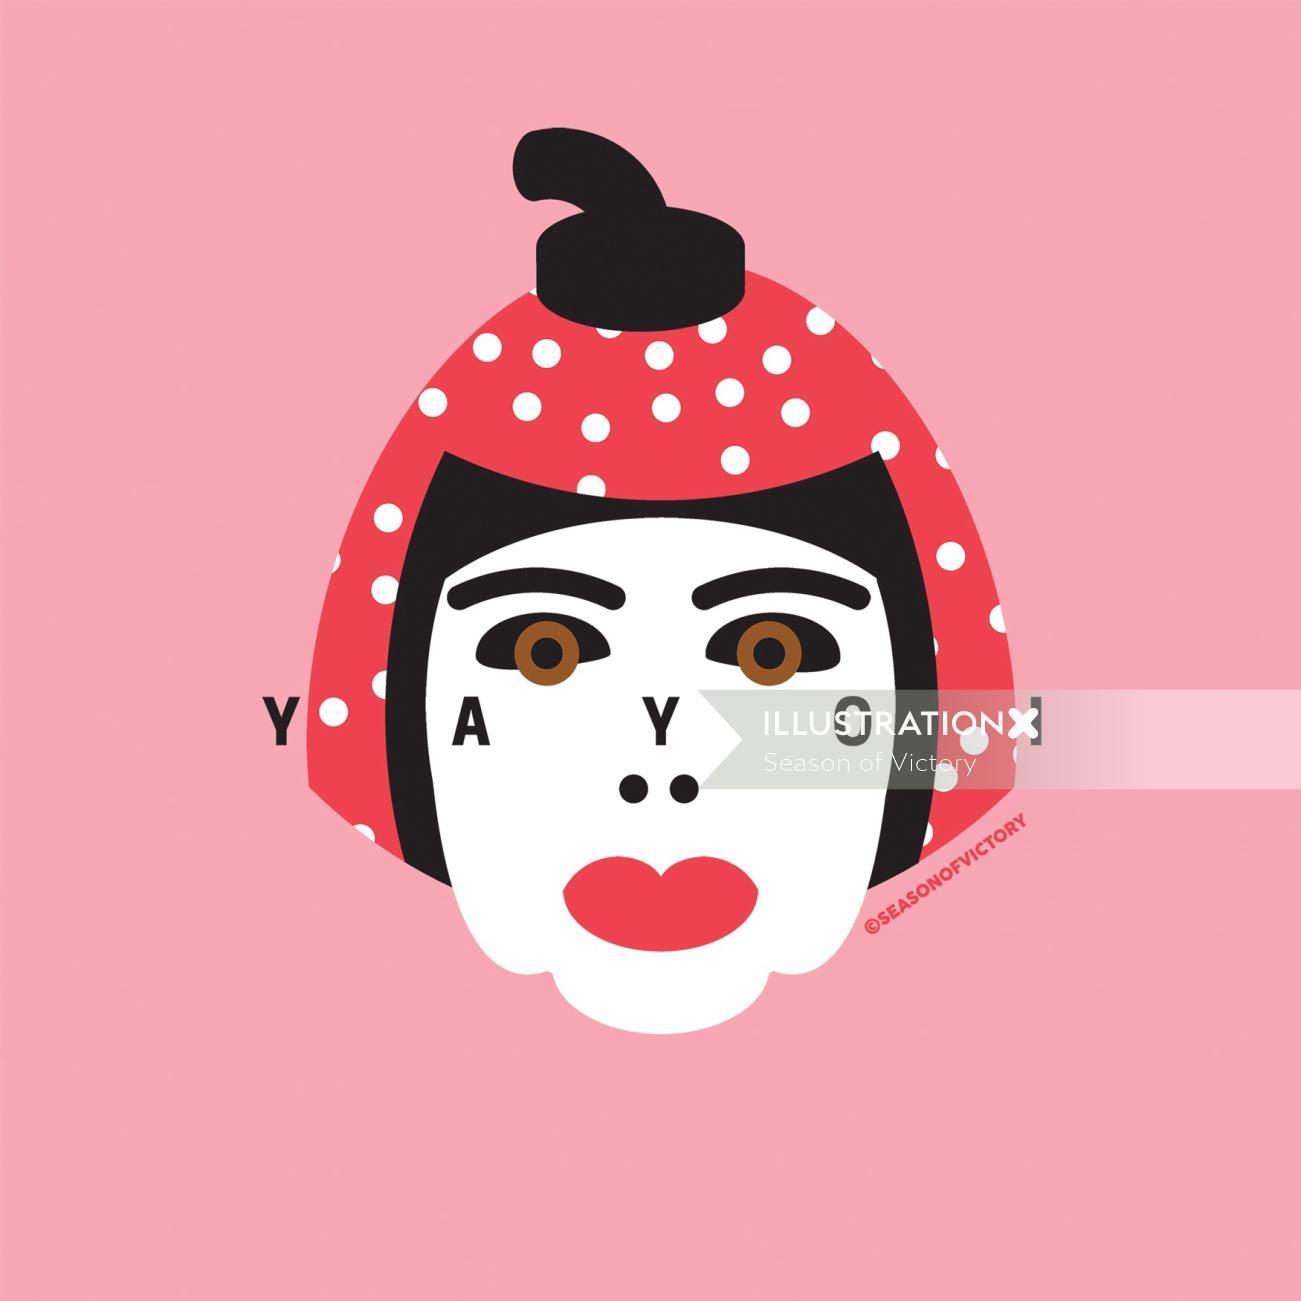 yayoi kusama, portrait, spot illustration, editorial illustration, artist, face, famous, head, portr